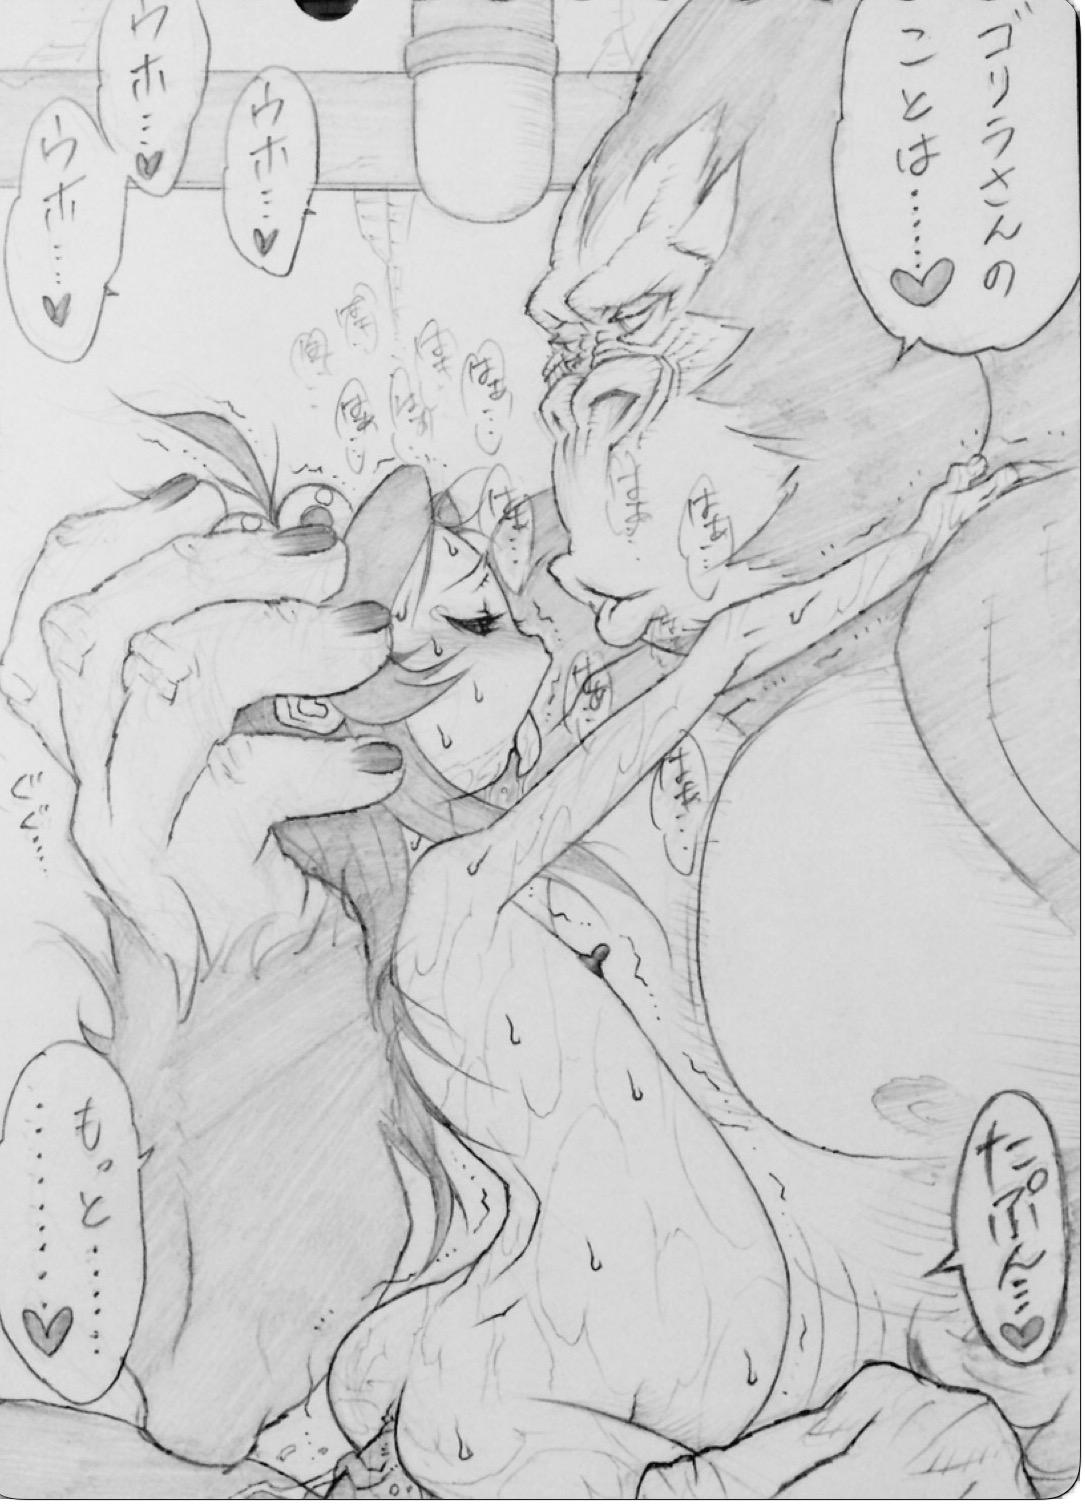 Gorilla-san and... 60